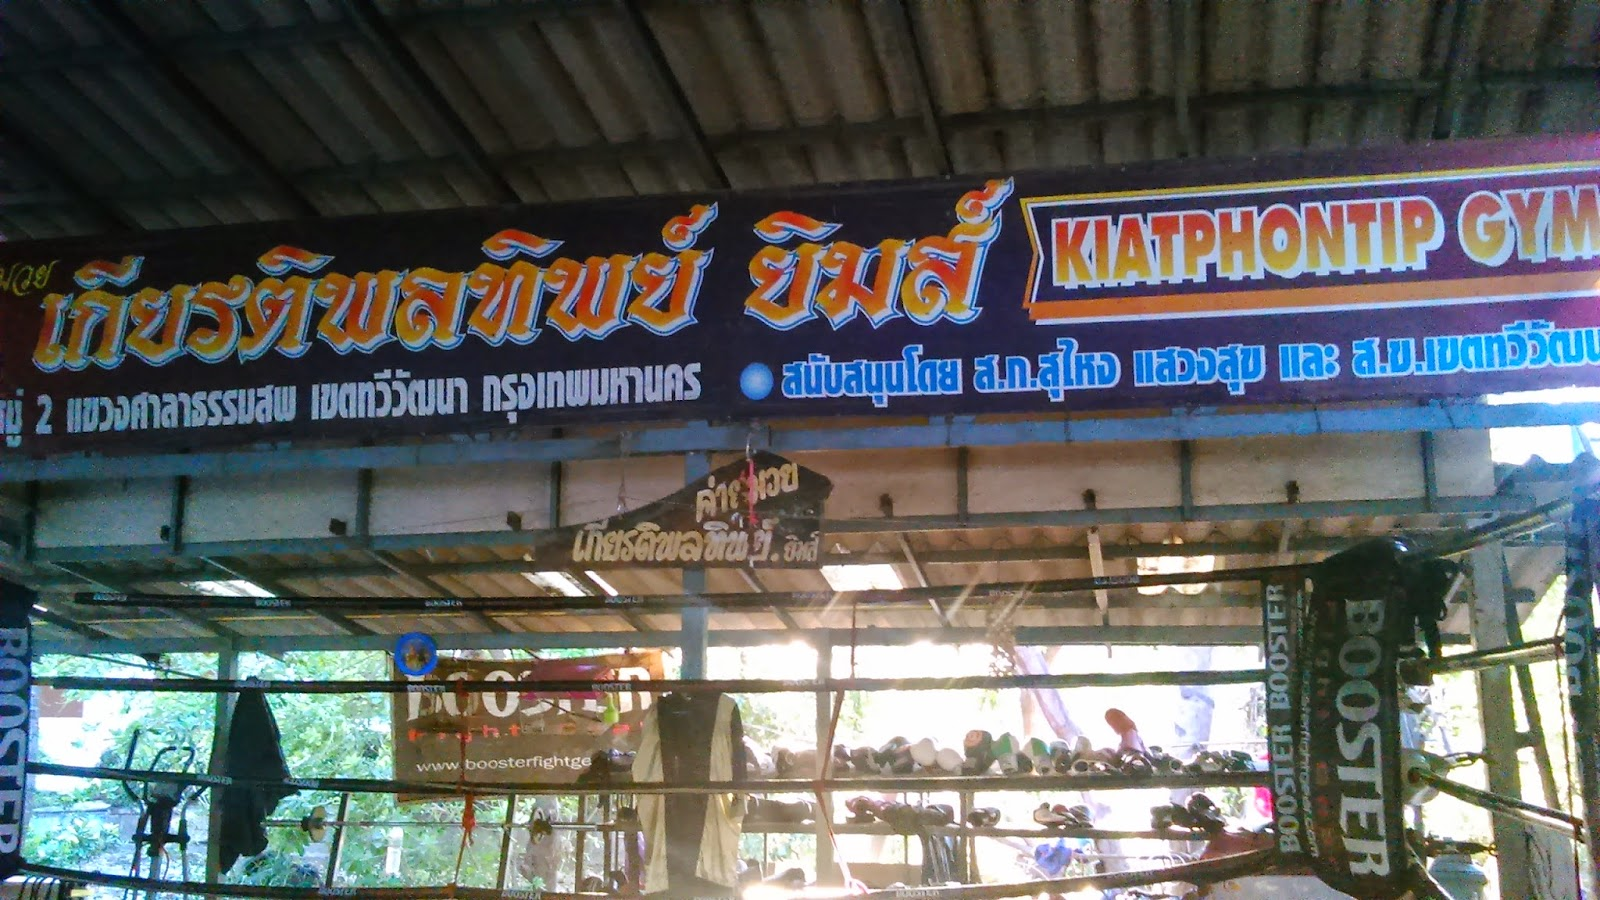 MuayThai Muay Thai Bangkok Kiatphontip Rob Cox